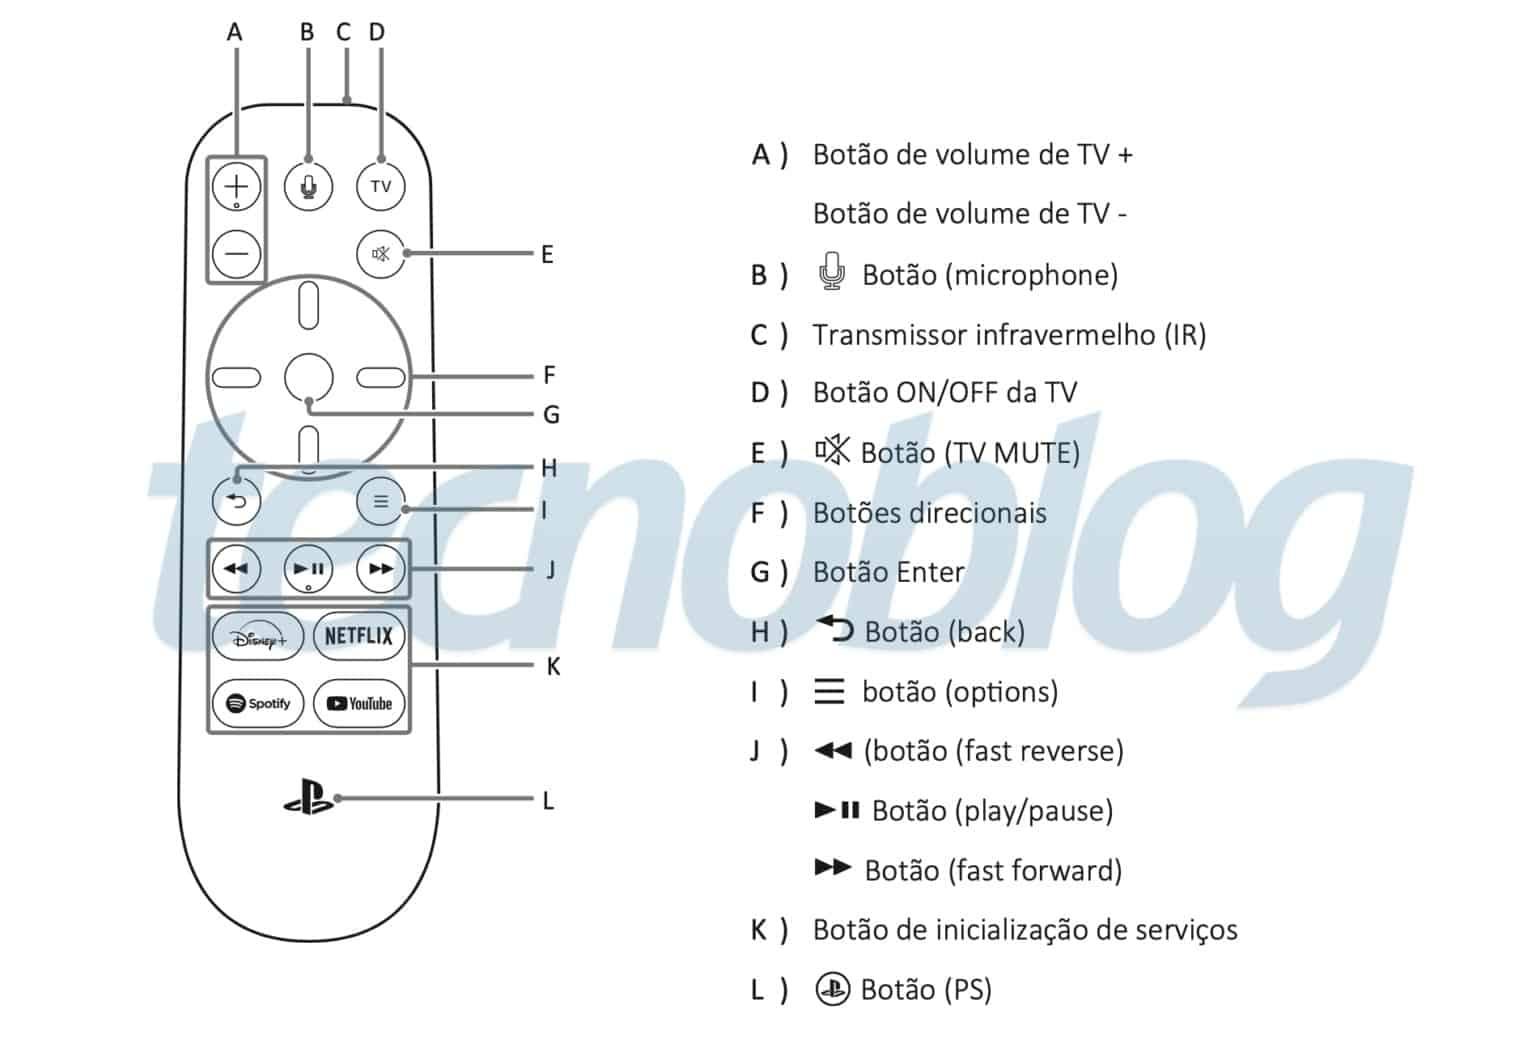 sony playsation 5, disney plus, disney+, afstandsbediening